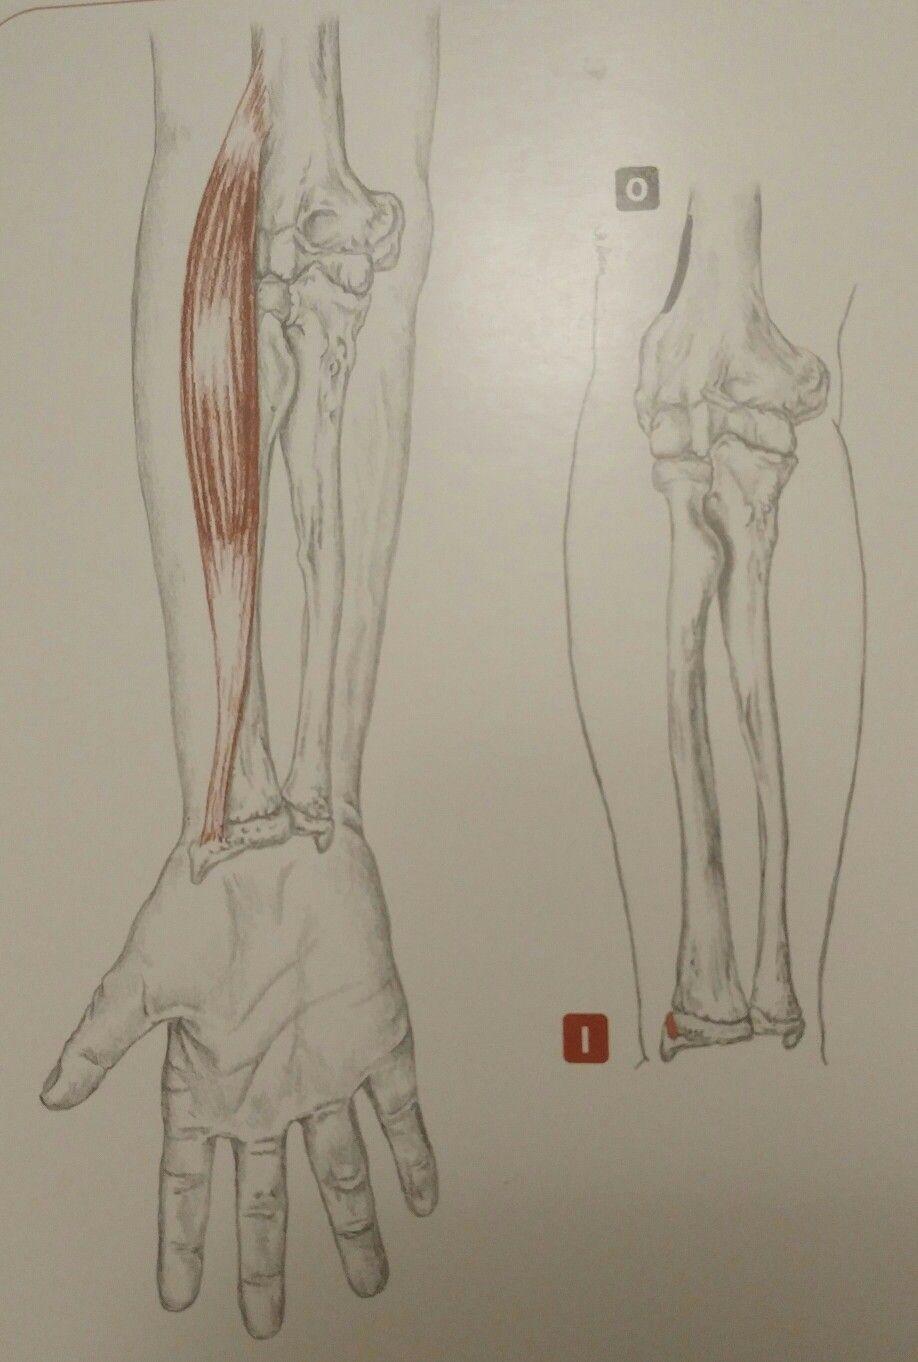 Brachioradialis - Actions - - Flex the elbow (humeroulnar jo ...